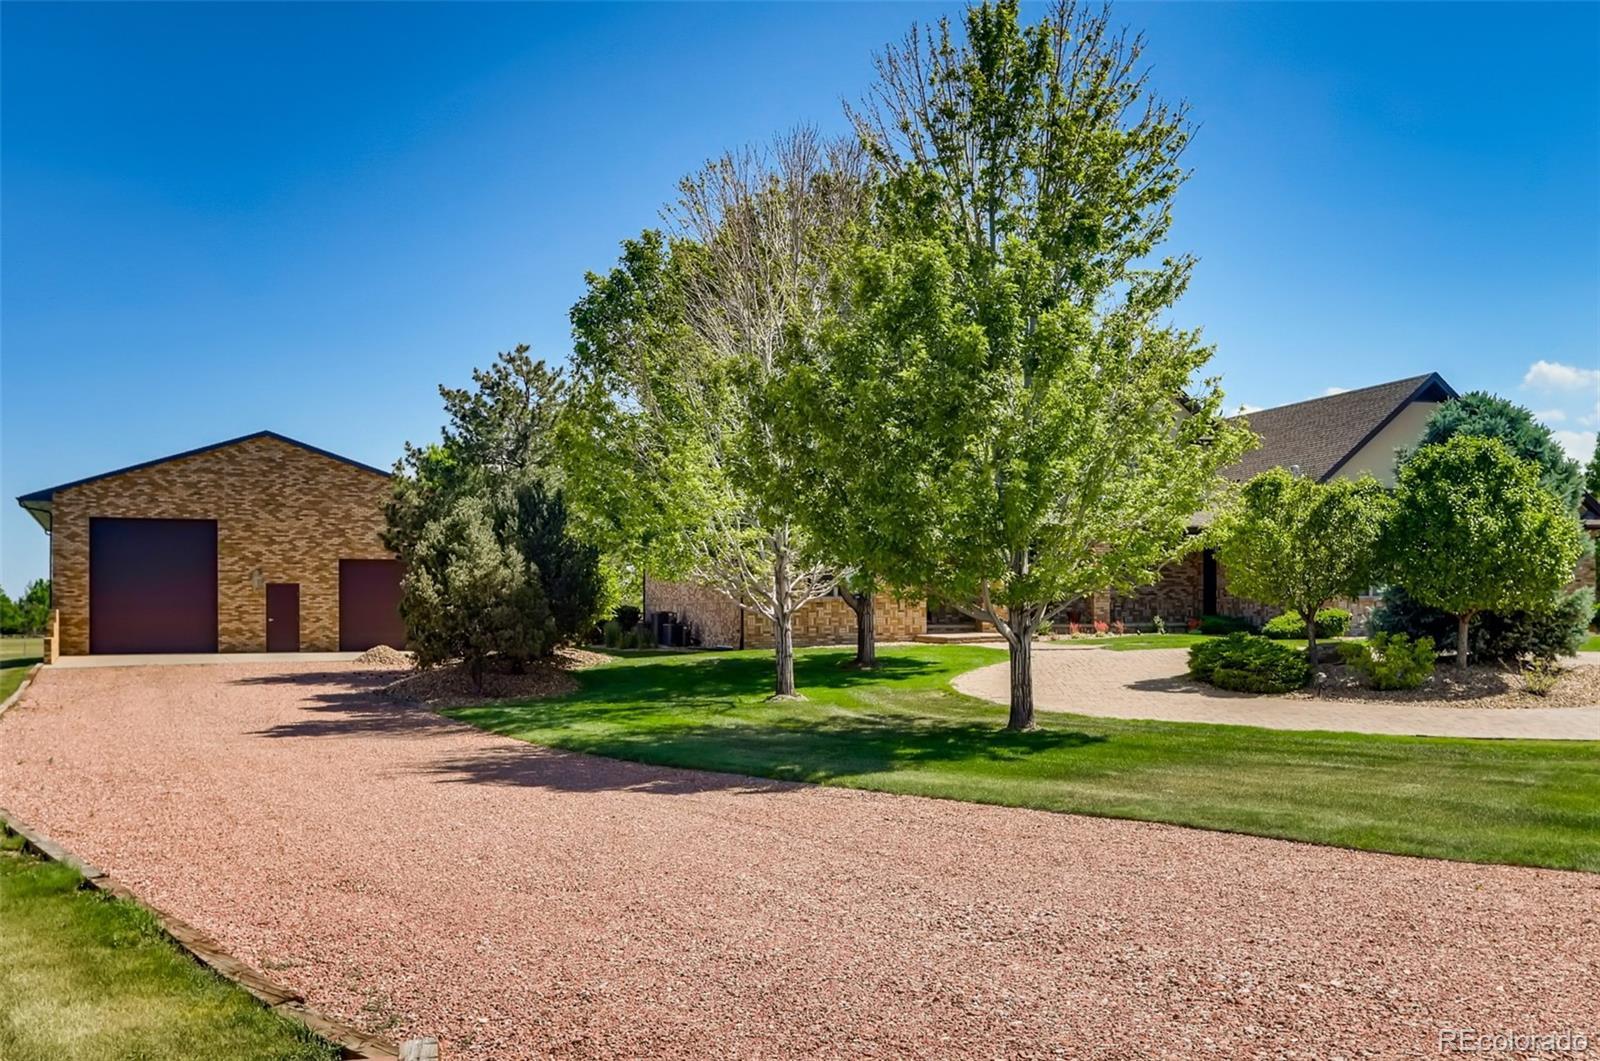 4335 Malibu Drive Property Photo - Berthoud, CO real estate listing